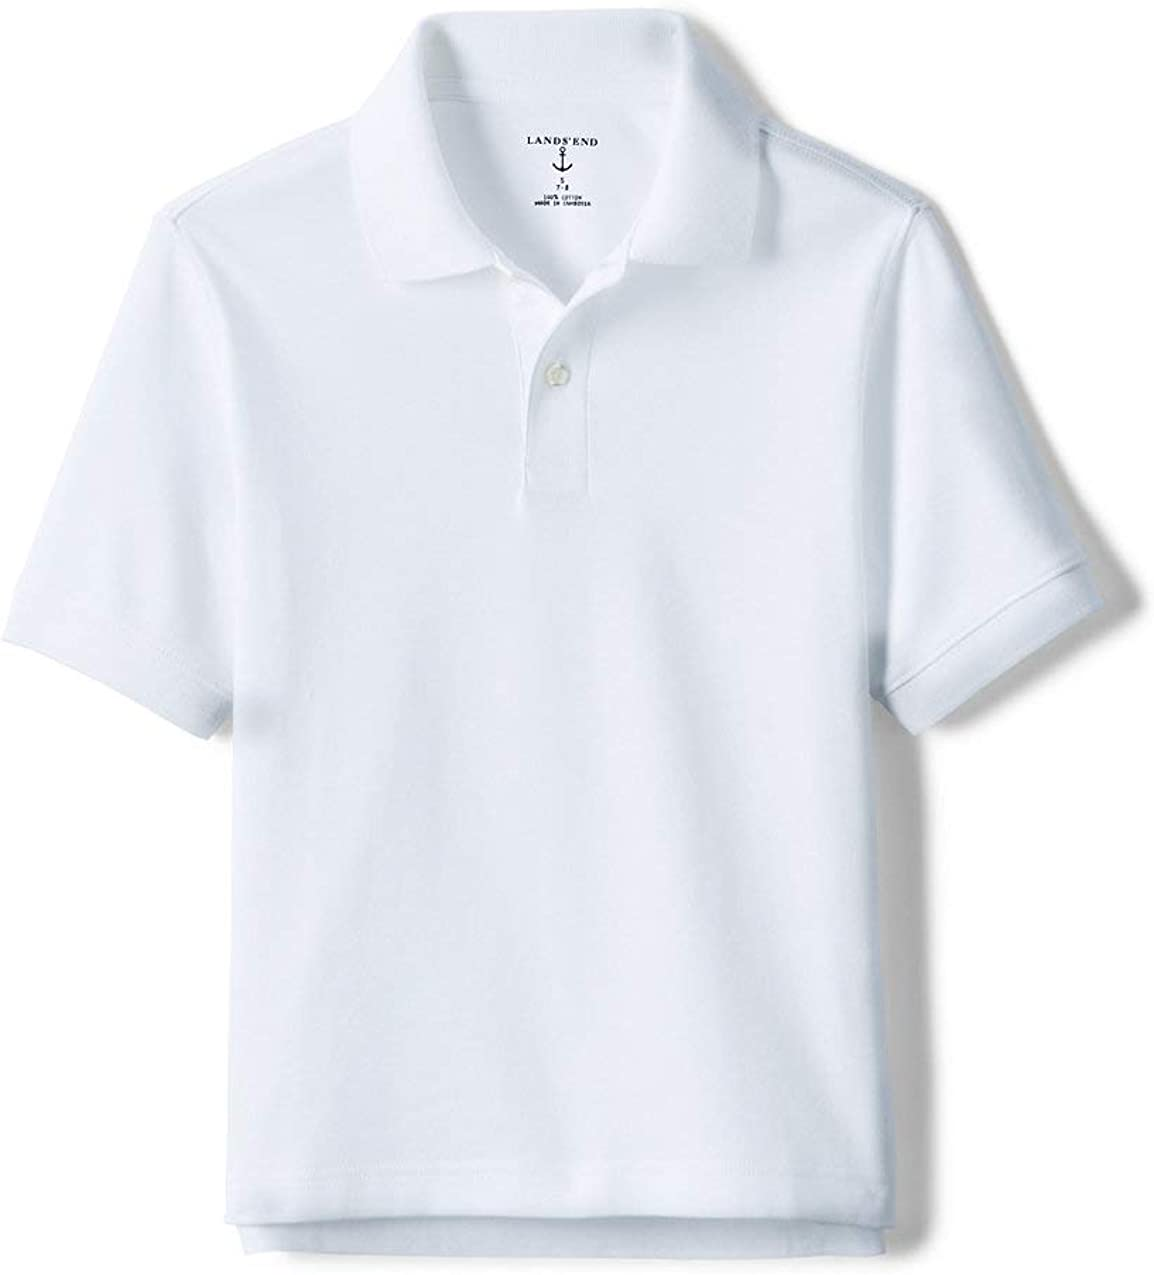 Lands' End School Uniform Kids Interlock Choice Shirt Sleeve Polo Short Al sold out.